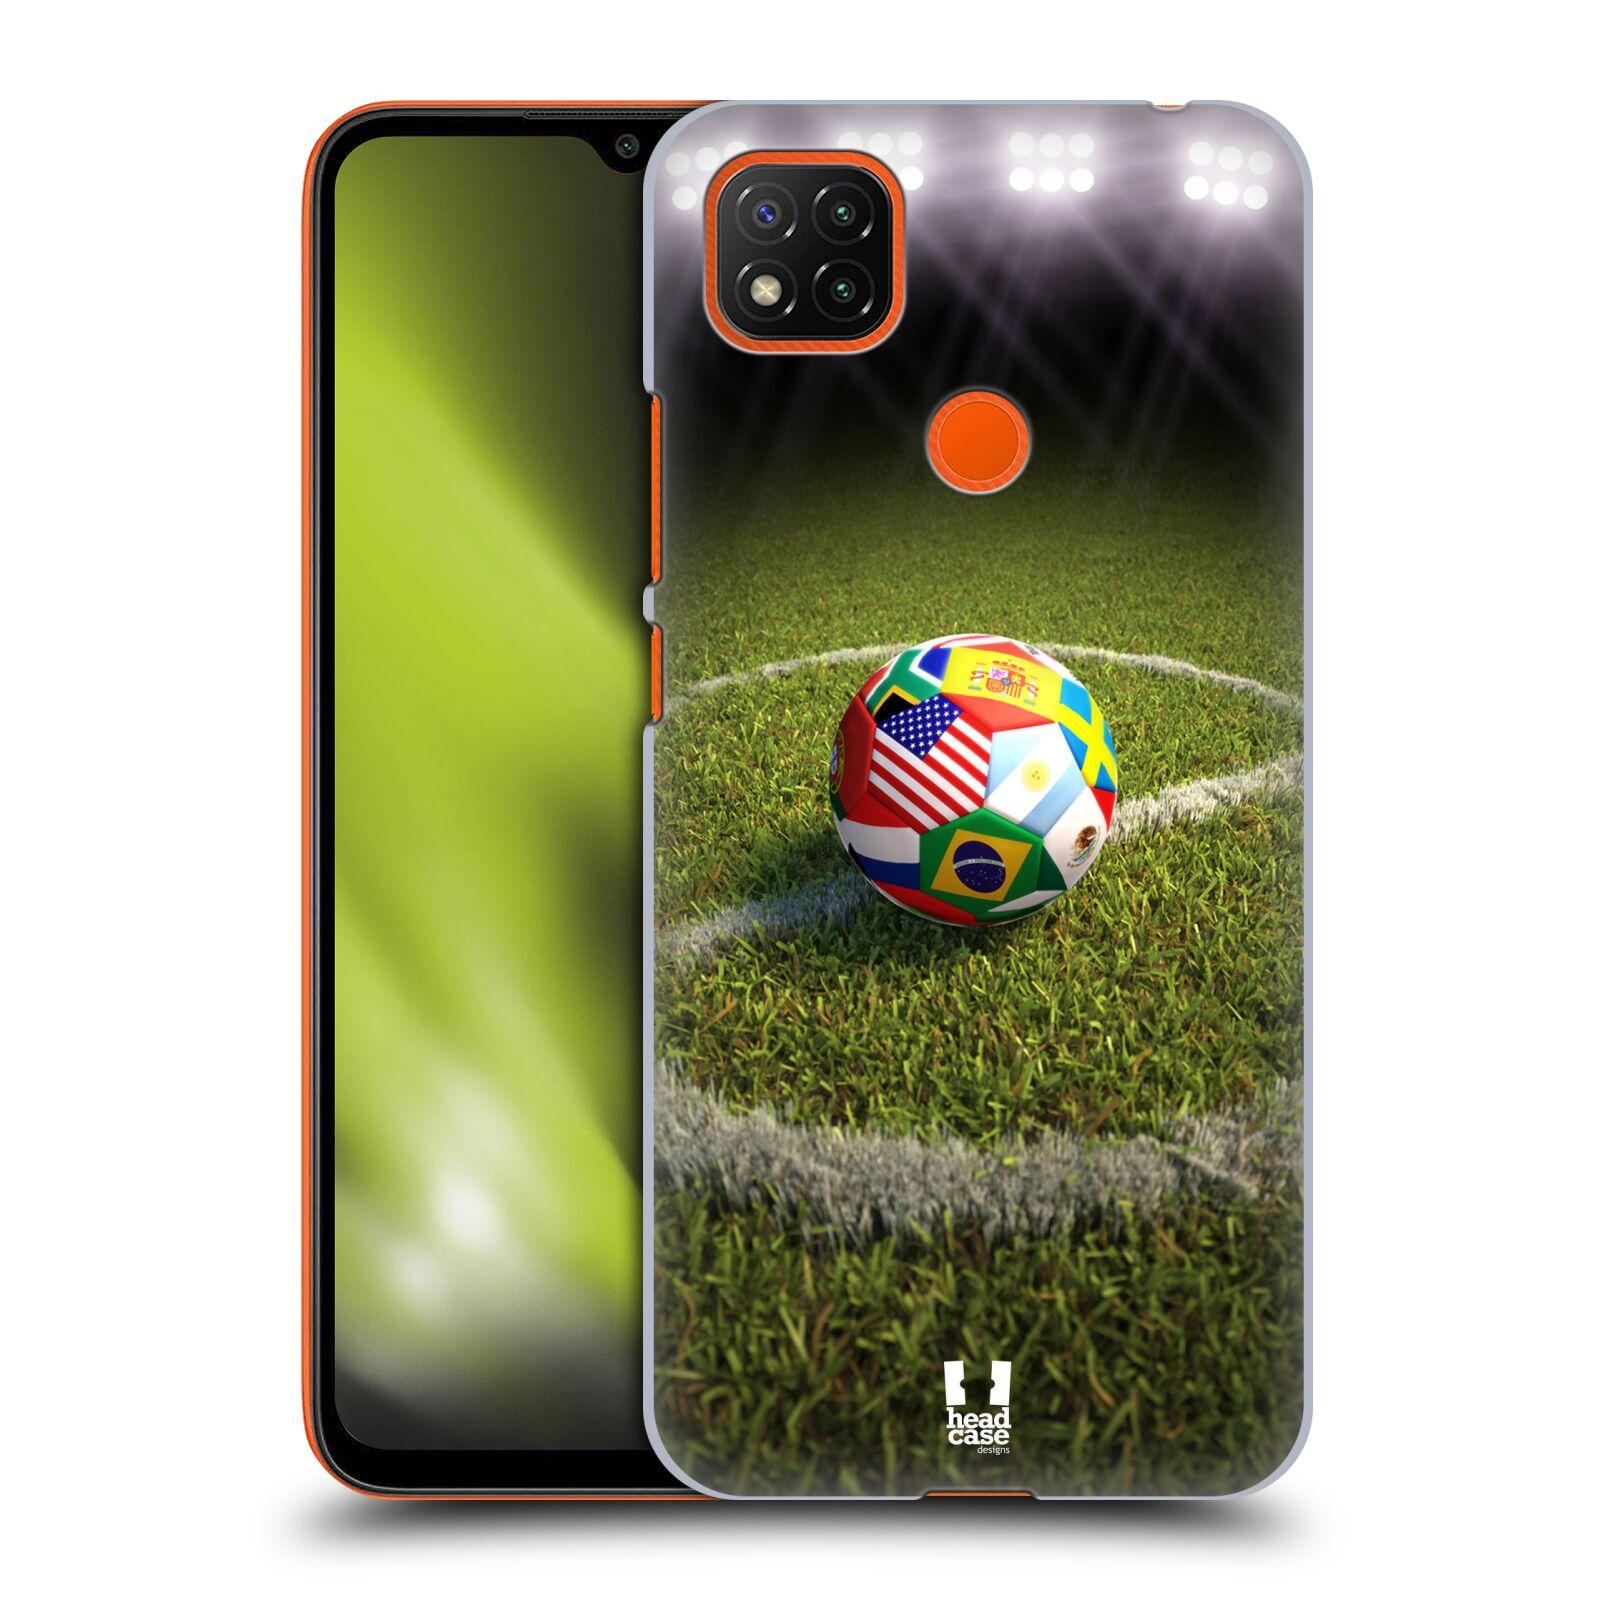 Plastové pouzdro na mobil Xiaomi Redmi 9C - Head Case - FOTBALOVÝ MÍČ ZEMÍ